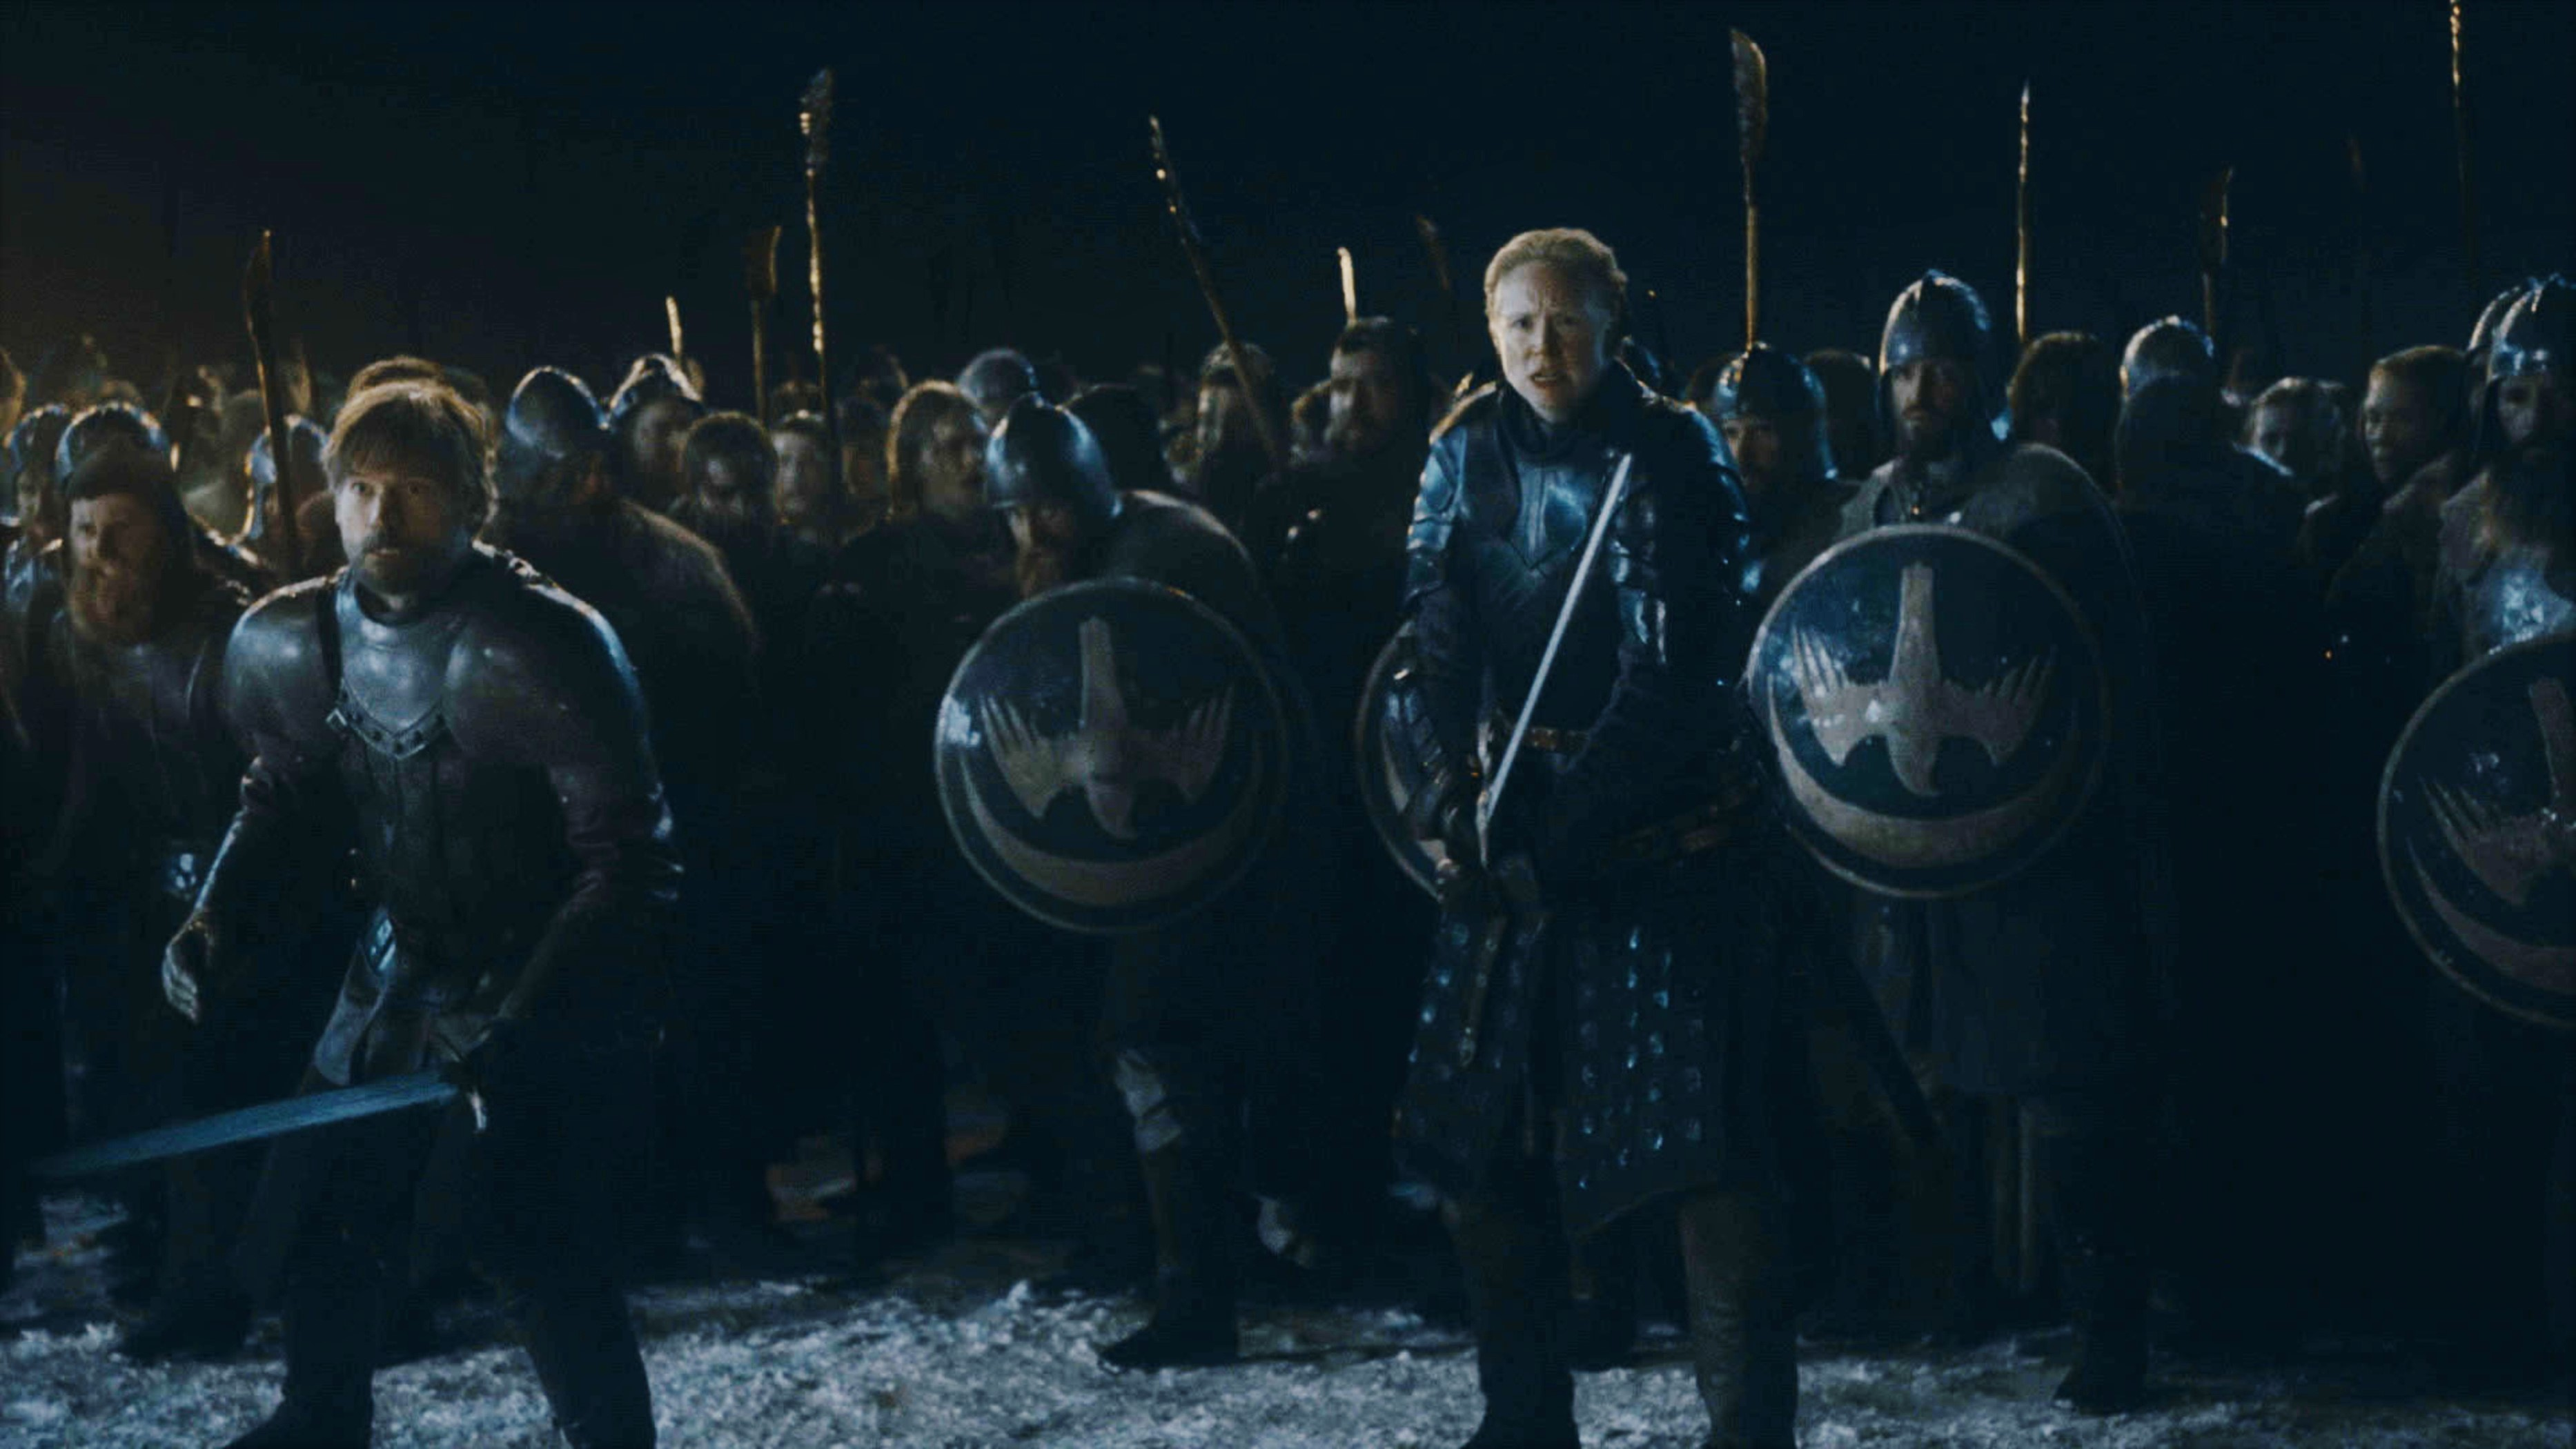 Jaime Lannister Ser Brienne of Tarth Battle of Winterfell Brightened Season 8 803